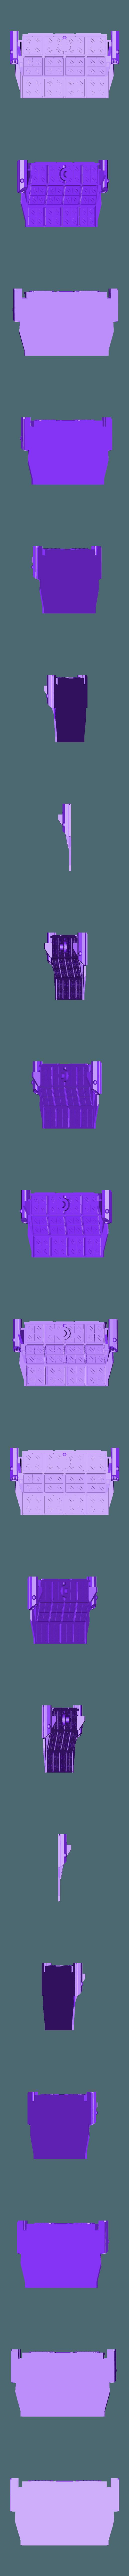 Minimal_Starship_Rear.stl Download free STL file Minimal Star Ship • Design to 3D print, mrhers2